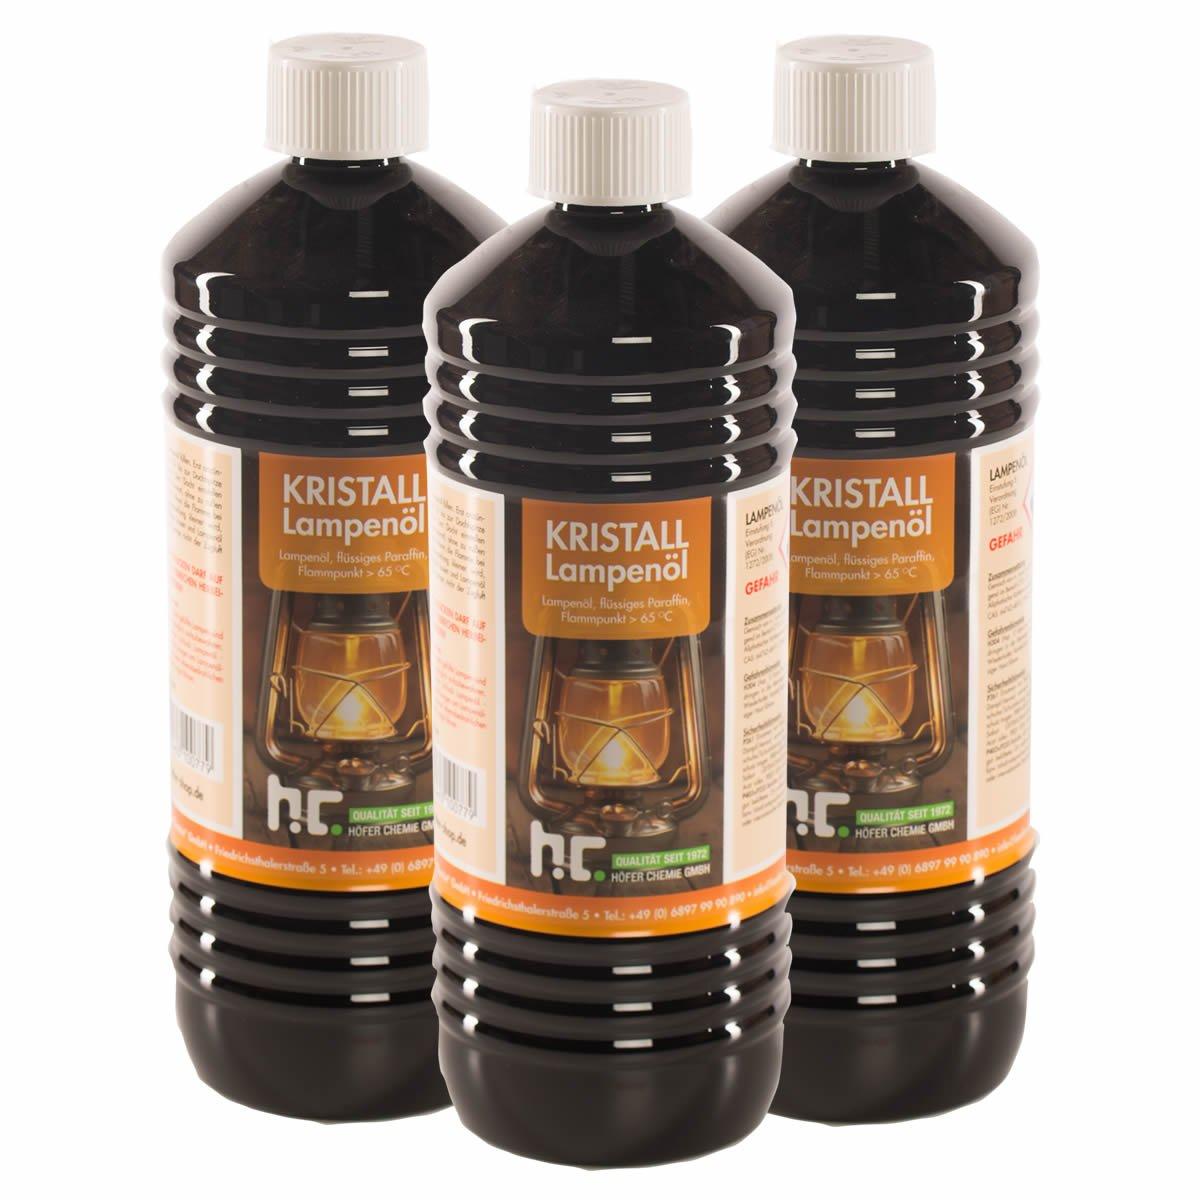 Lotto di 6bottiglie da 1l di olio di paraffina per lampada, inodore Höfer Chemie ®